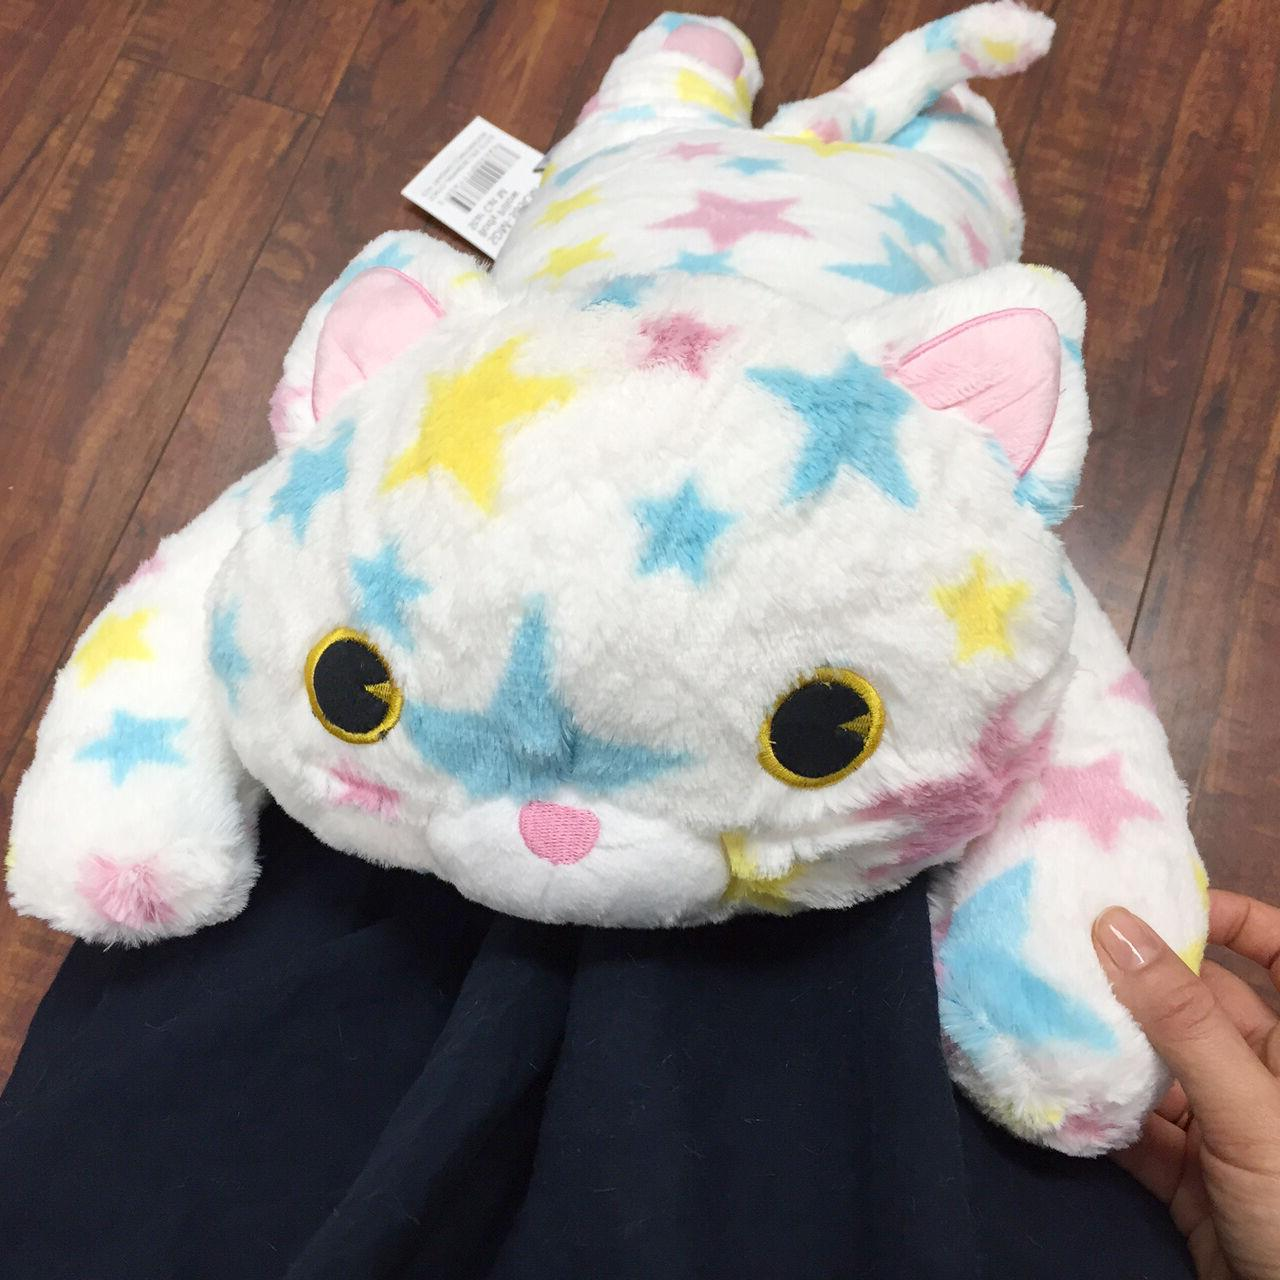 Tokyo Japanese Gift - Long Body Pillow - Animla Pillow - Hug